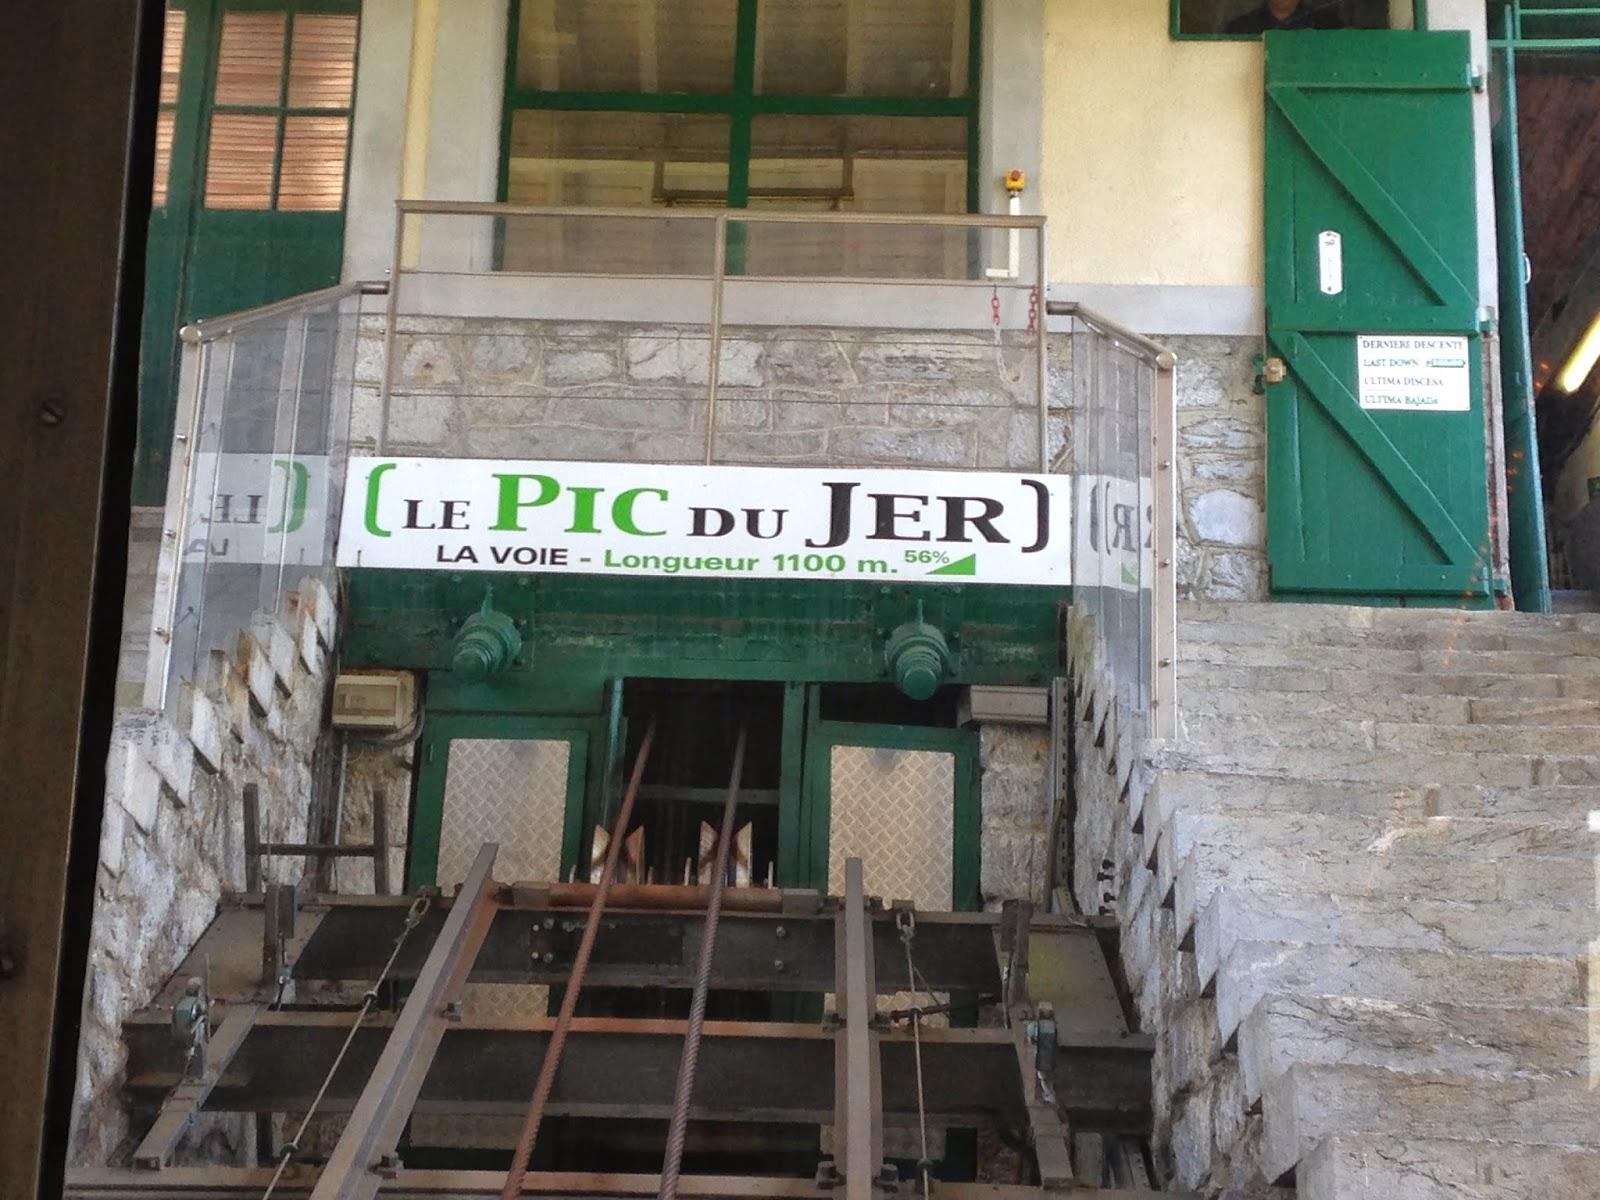 Teleférico Pic du Jer